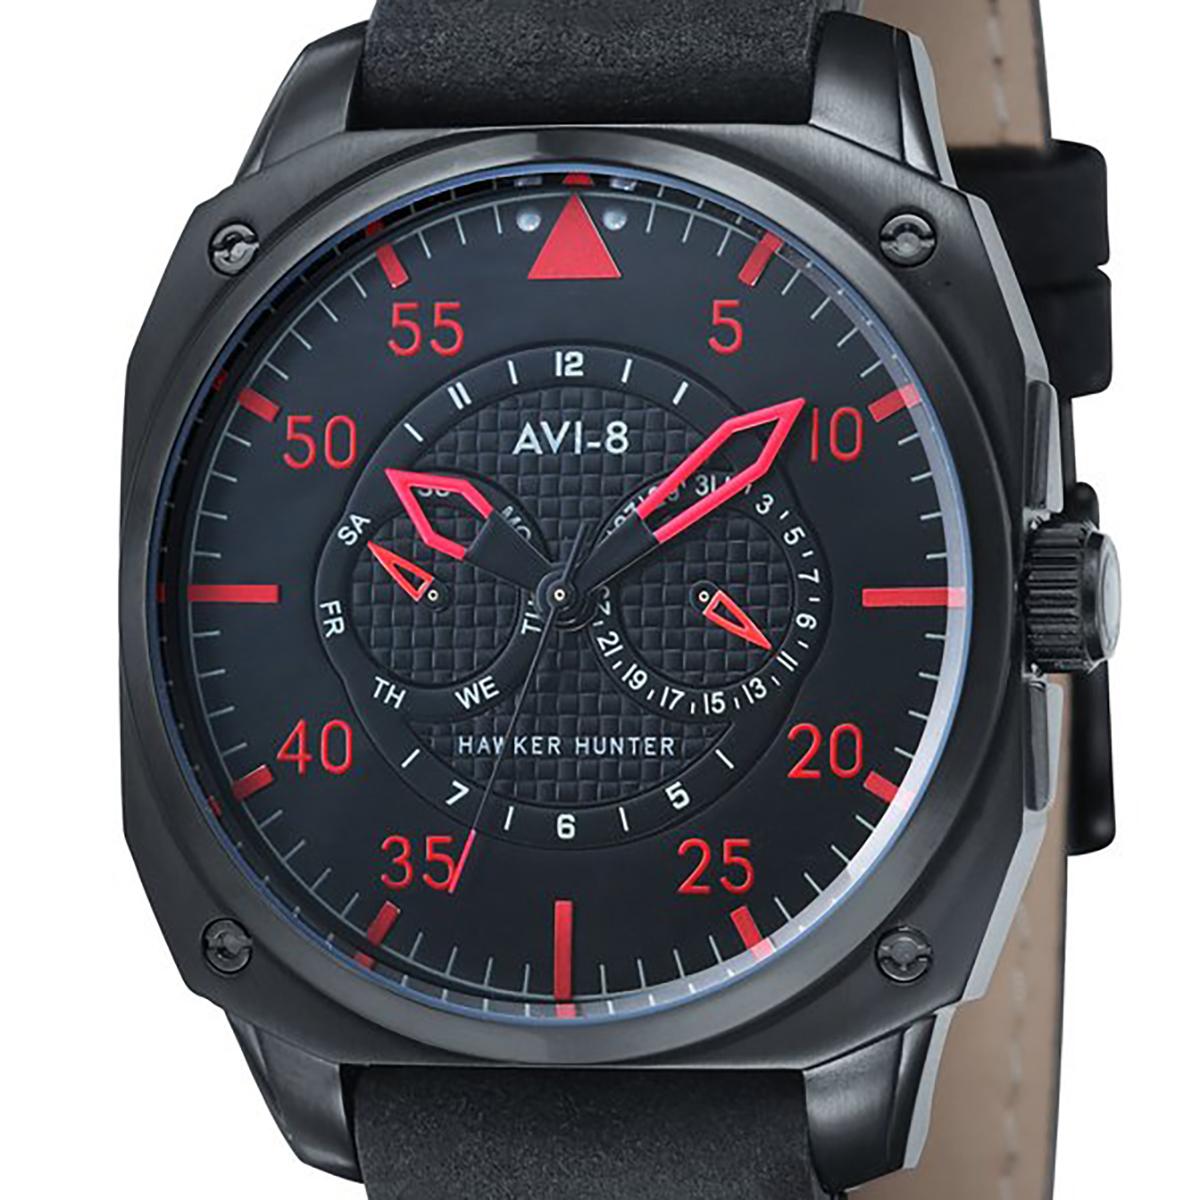 AVI-8 アヴィエイト 電池式クォーツ 腕時計 [AV-4009-03] 並行輸入品 純正ケース メーカー保証 24ヶ月